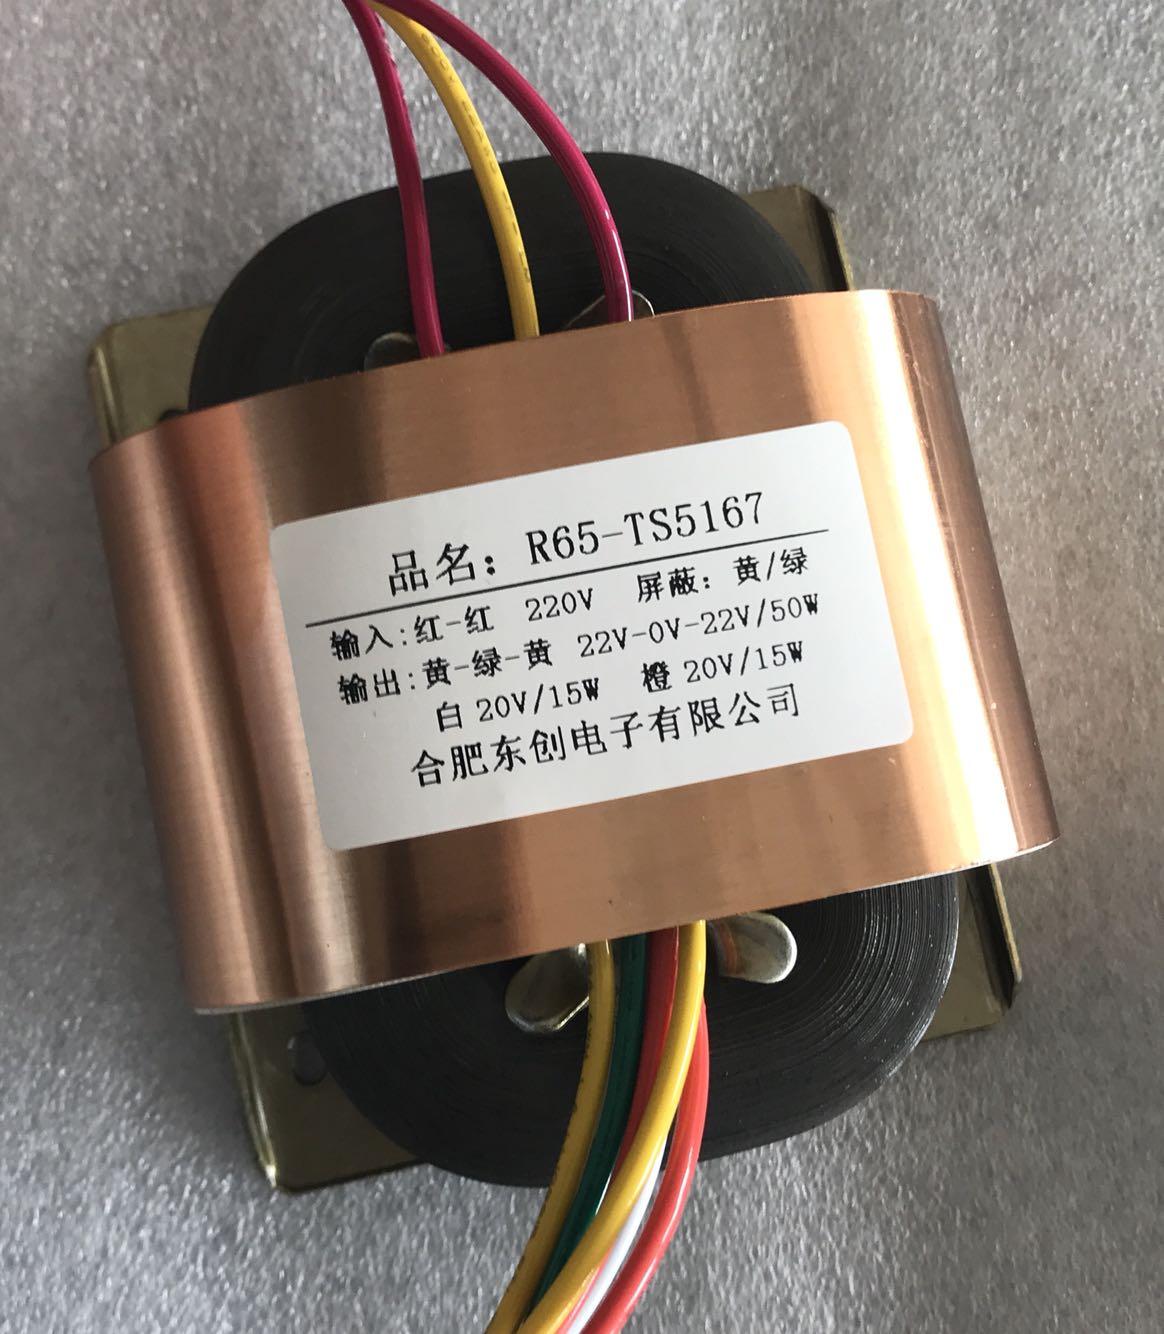 22V-0-22V 1.1A 2*20V 0.75A R Core Transformer 80VA R65 custom transformer 220V copper shield Power amplifier 2500pcs zmm22v ll 34 zmm 22v 1 2w 1206 22v 0 5w smd